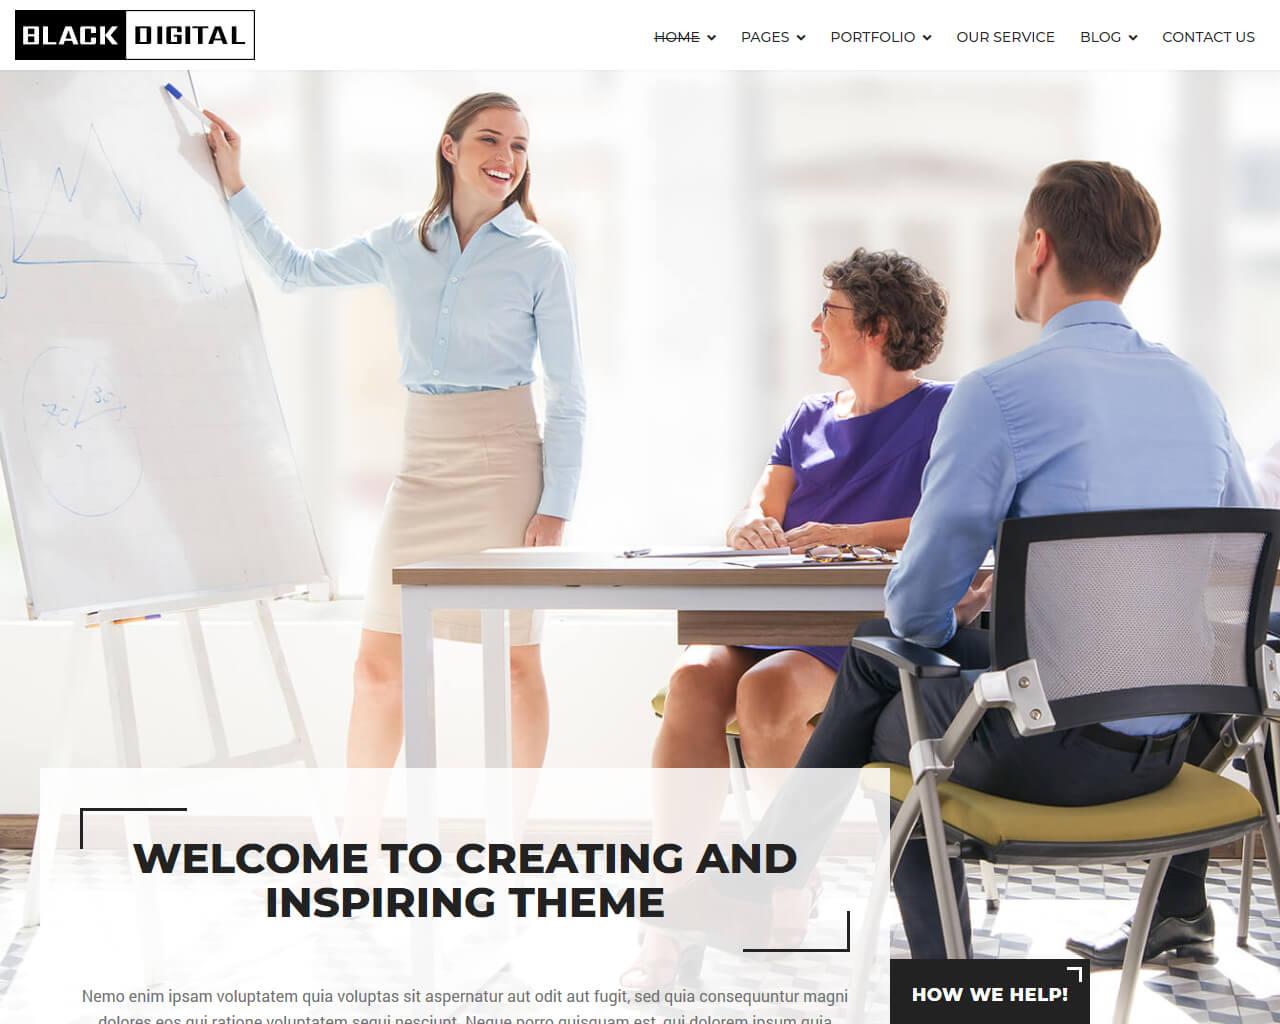 Black Digital Website Template